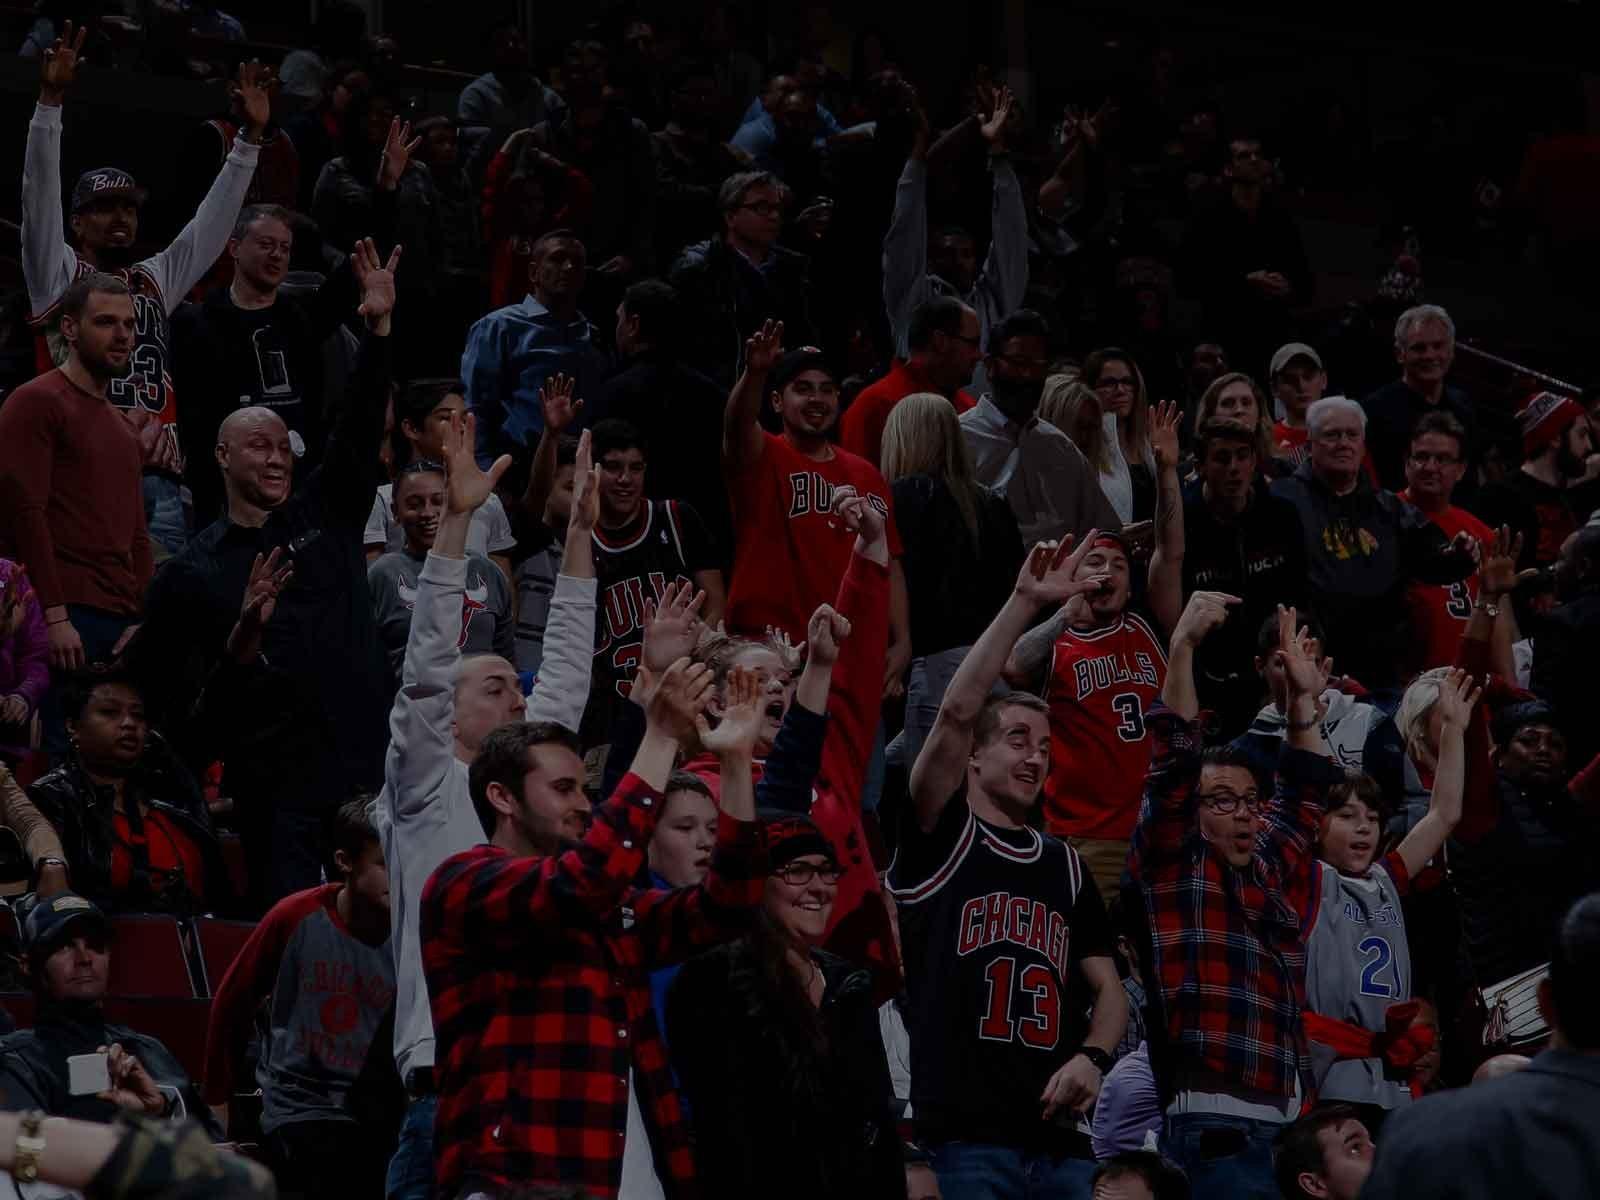 Calendario Nba 2019 Knicks Más Populares Chicago Bulls Tickets Of Calendario Nba 2019 Knicks Más Populares Sportando